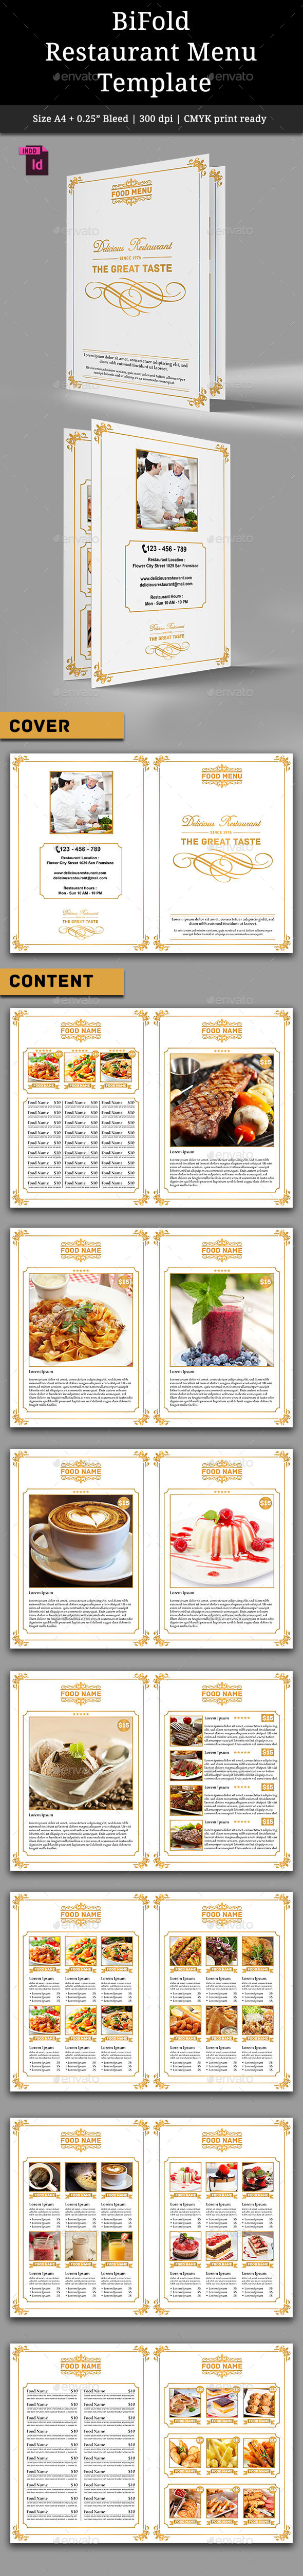 BiFold Restaurant Menu Vol. 3 - Food Menus Print Templates